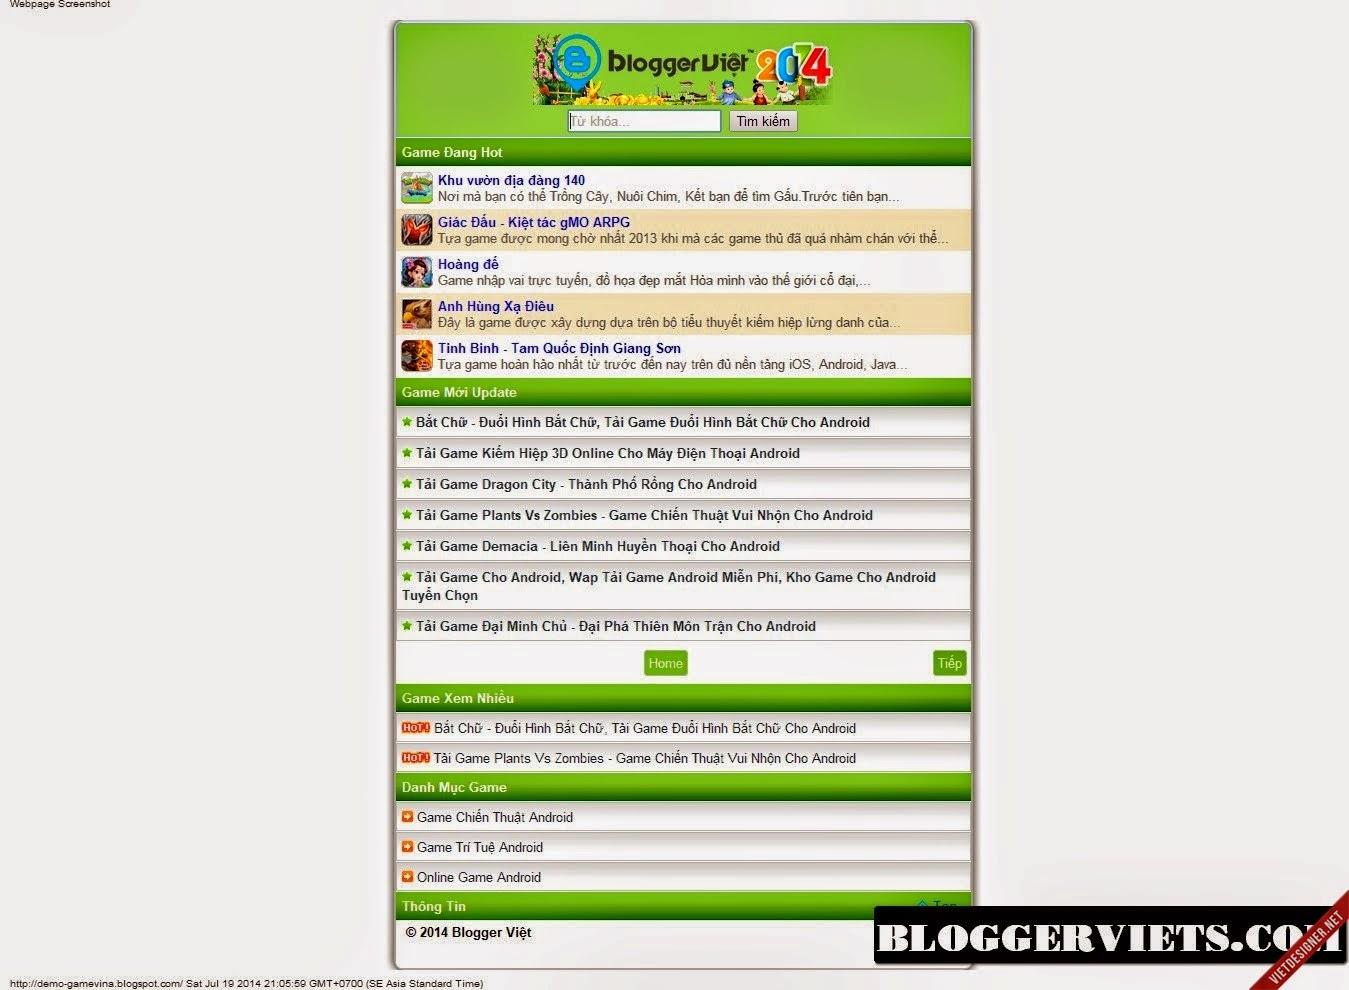 Share Free 2 Template Blogspot Wap Game Mobile Đẹp